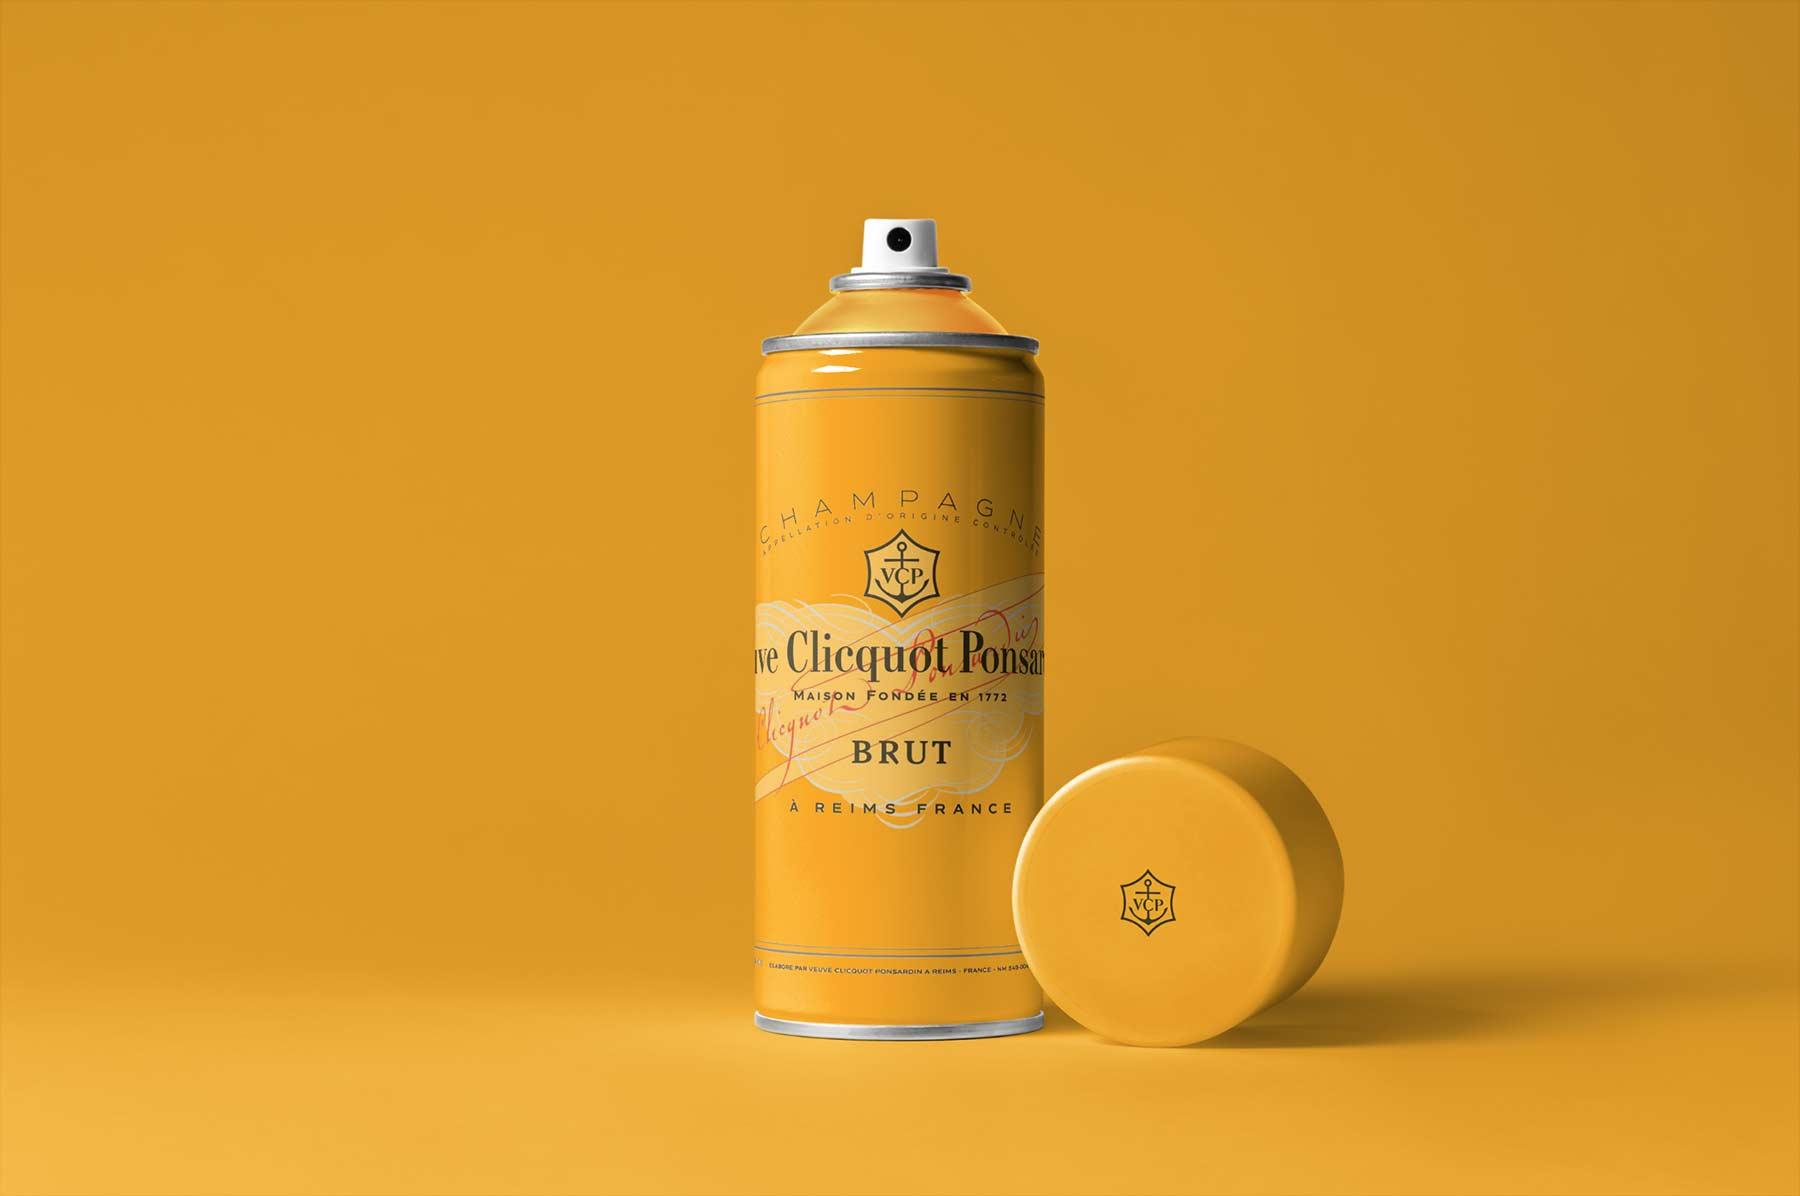 Luxus-Spraydosen Nouveau-Riche-luxus-farbdosen_06